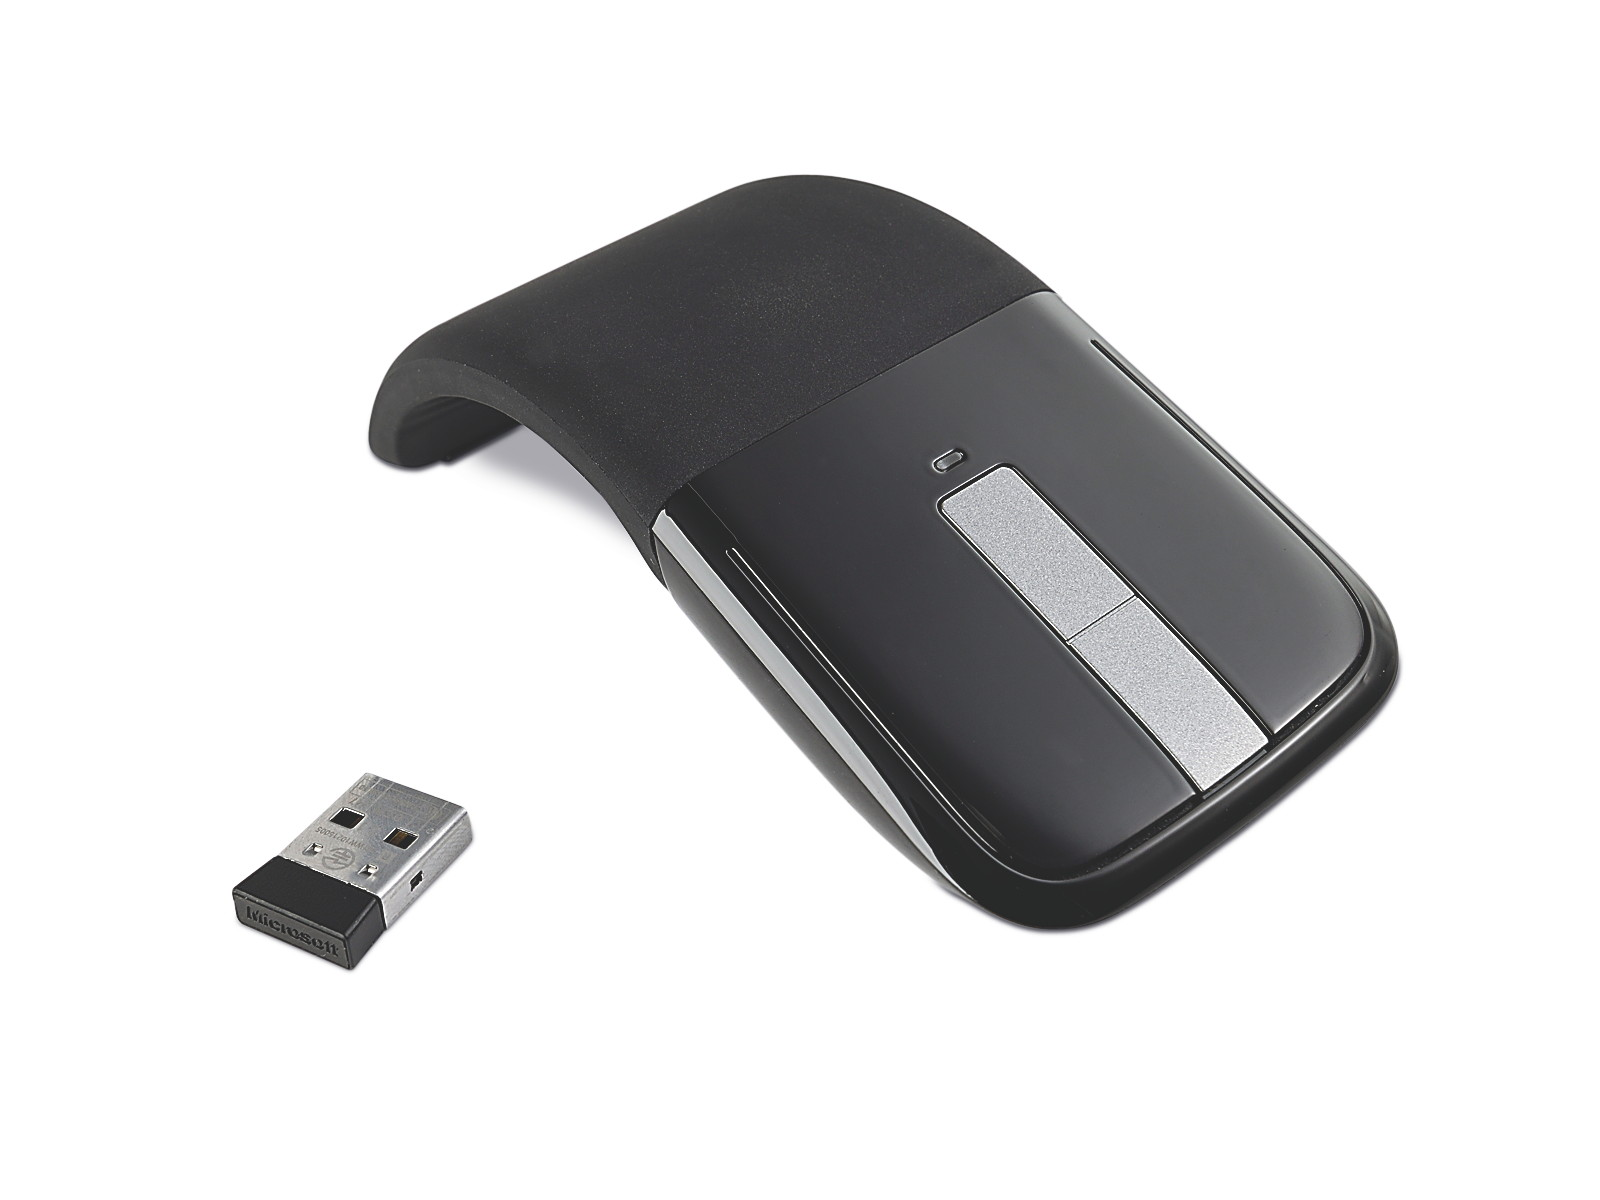 Microsoft Arc Touch Mouse - мышка с гибким корпусом (9)